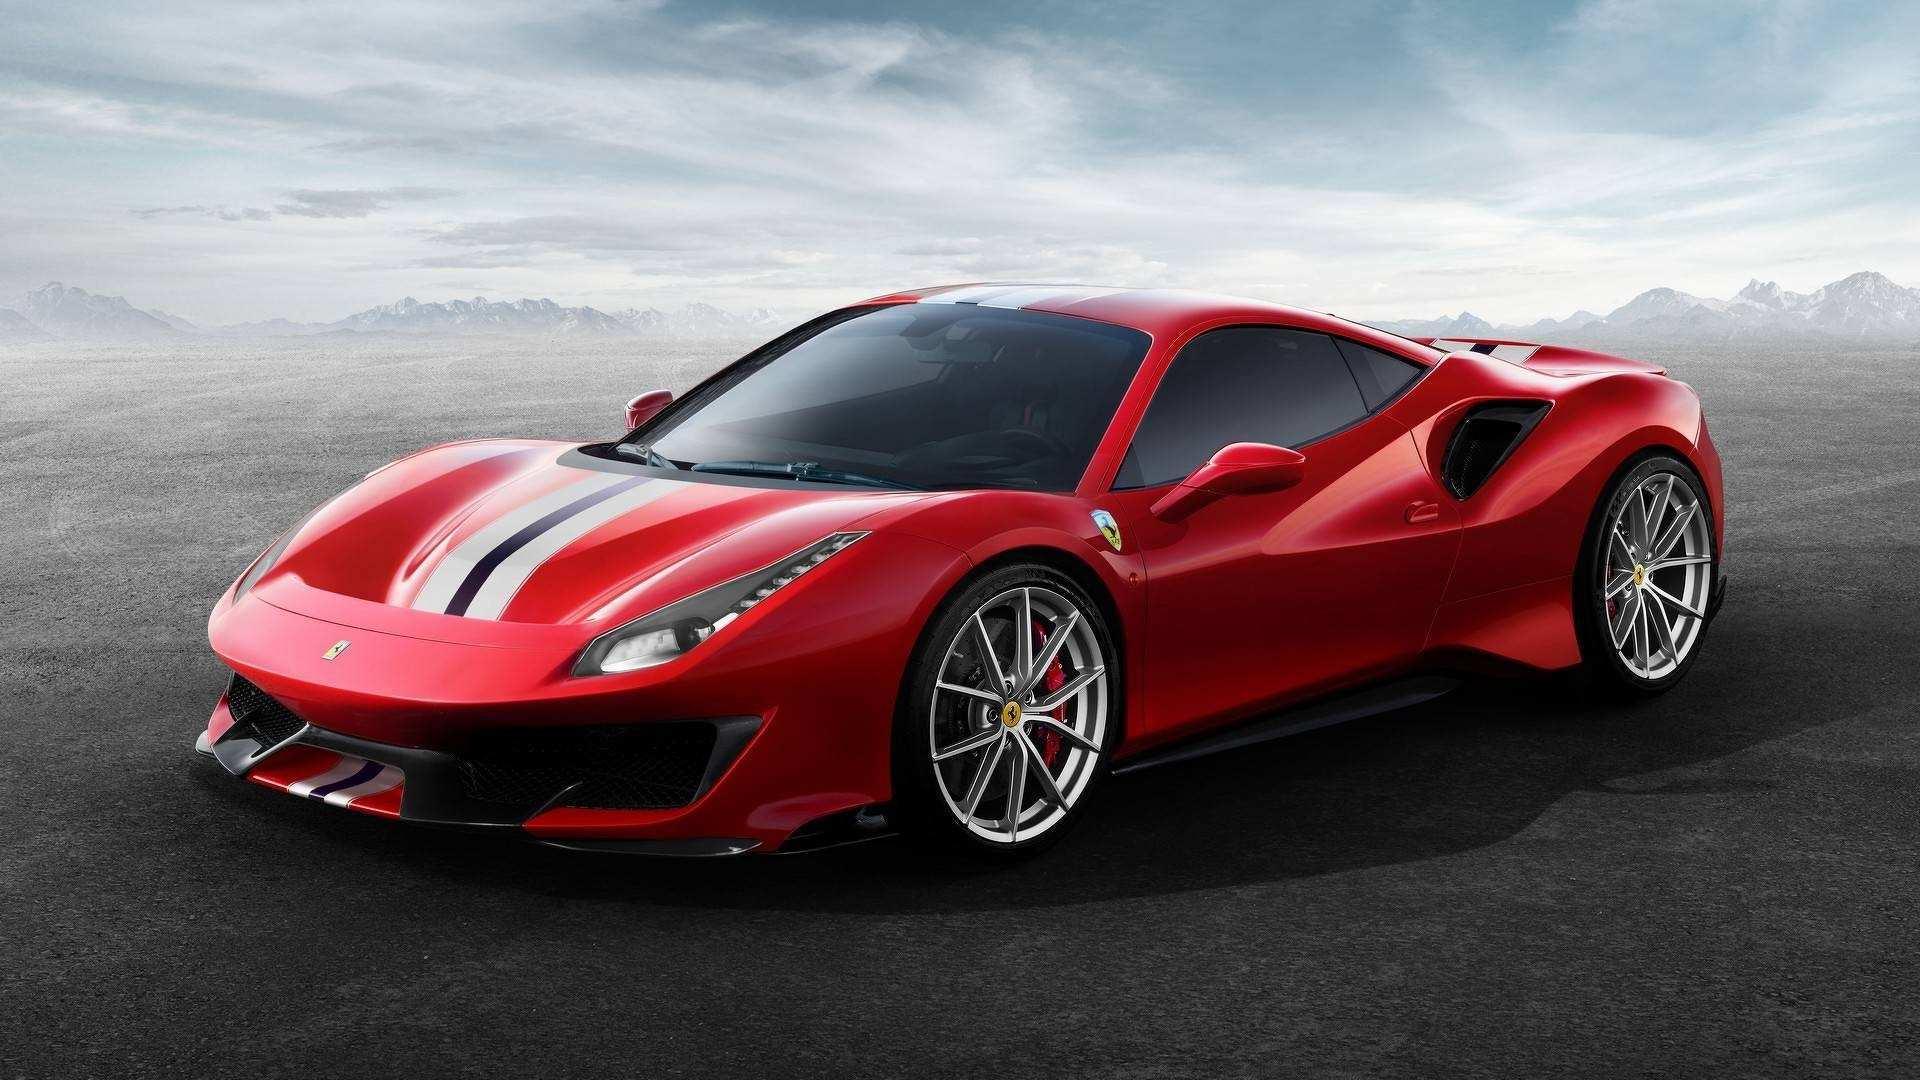 62 Best Review The La Nuova Ferrari 2019 First Drive Exterior and Interior with The La Nuova Ferrari 2019 First Drive